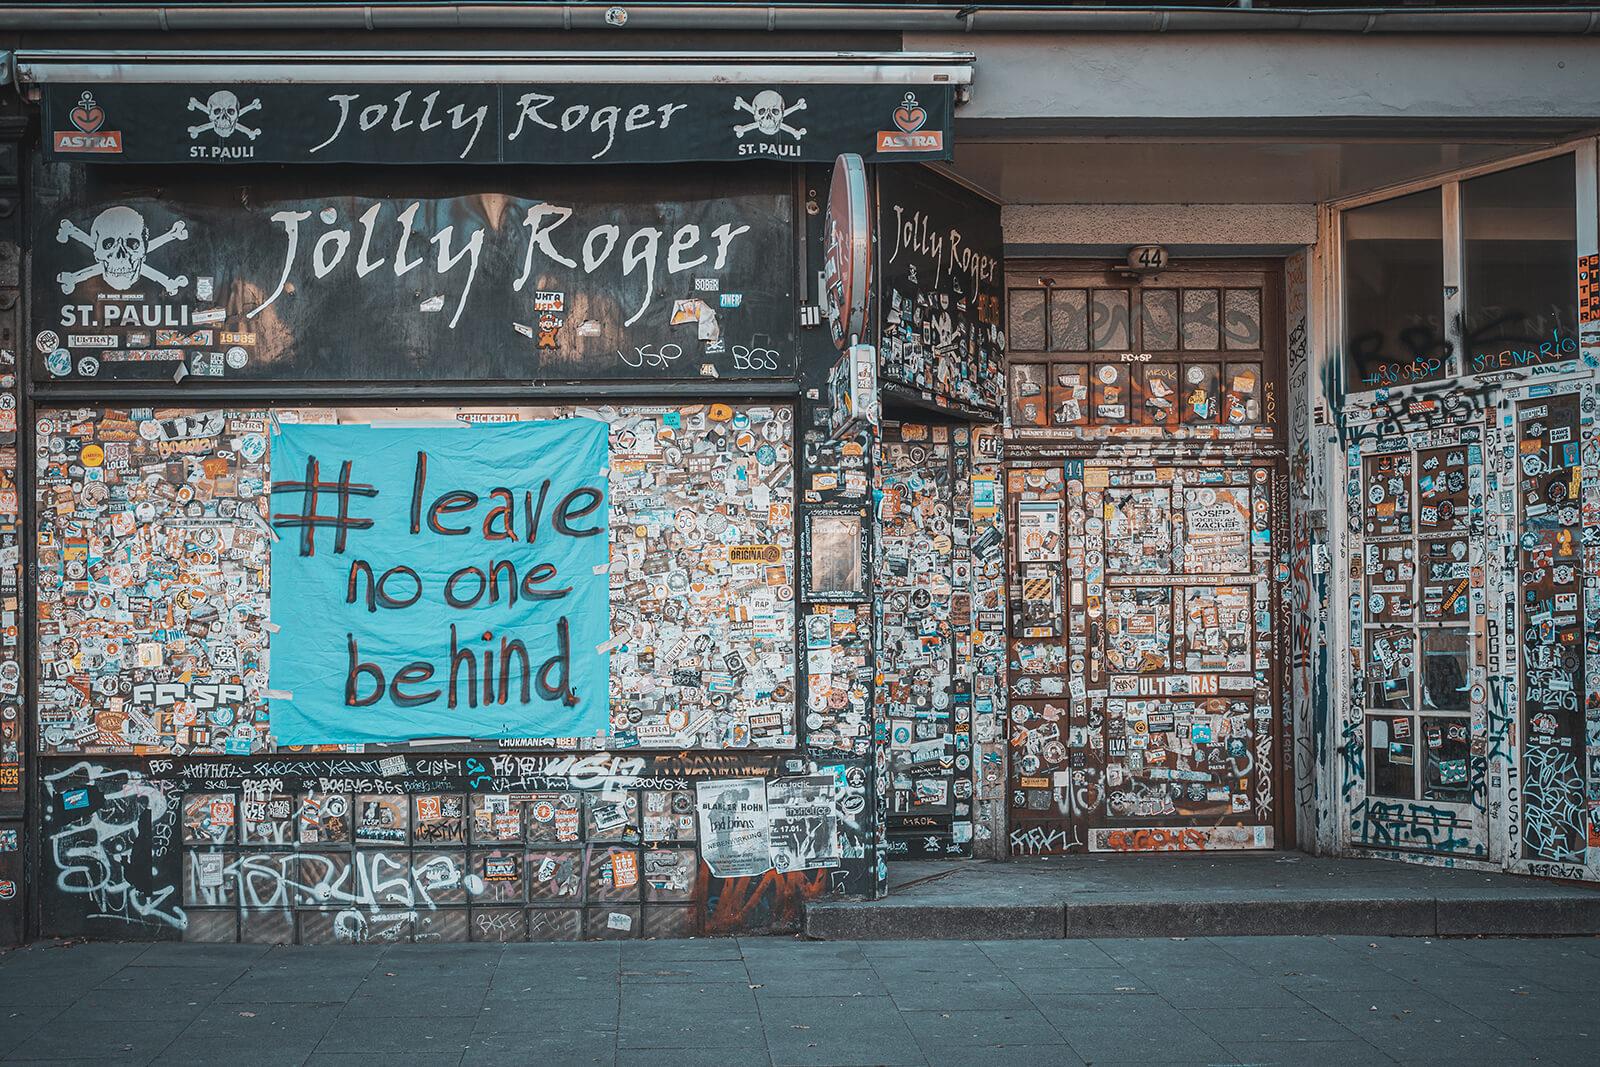 Jolly Roger St. Pauli